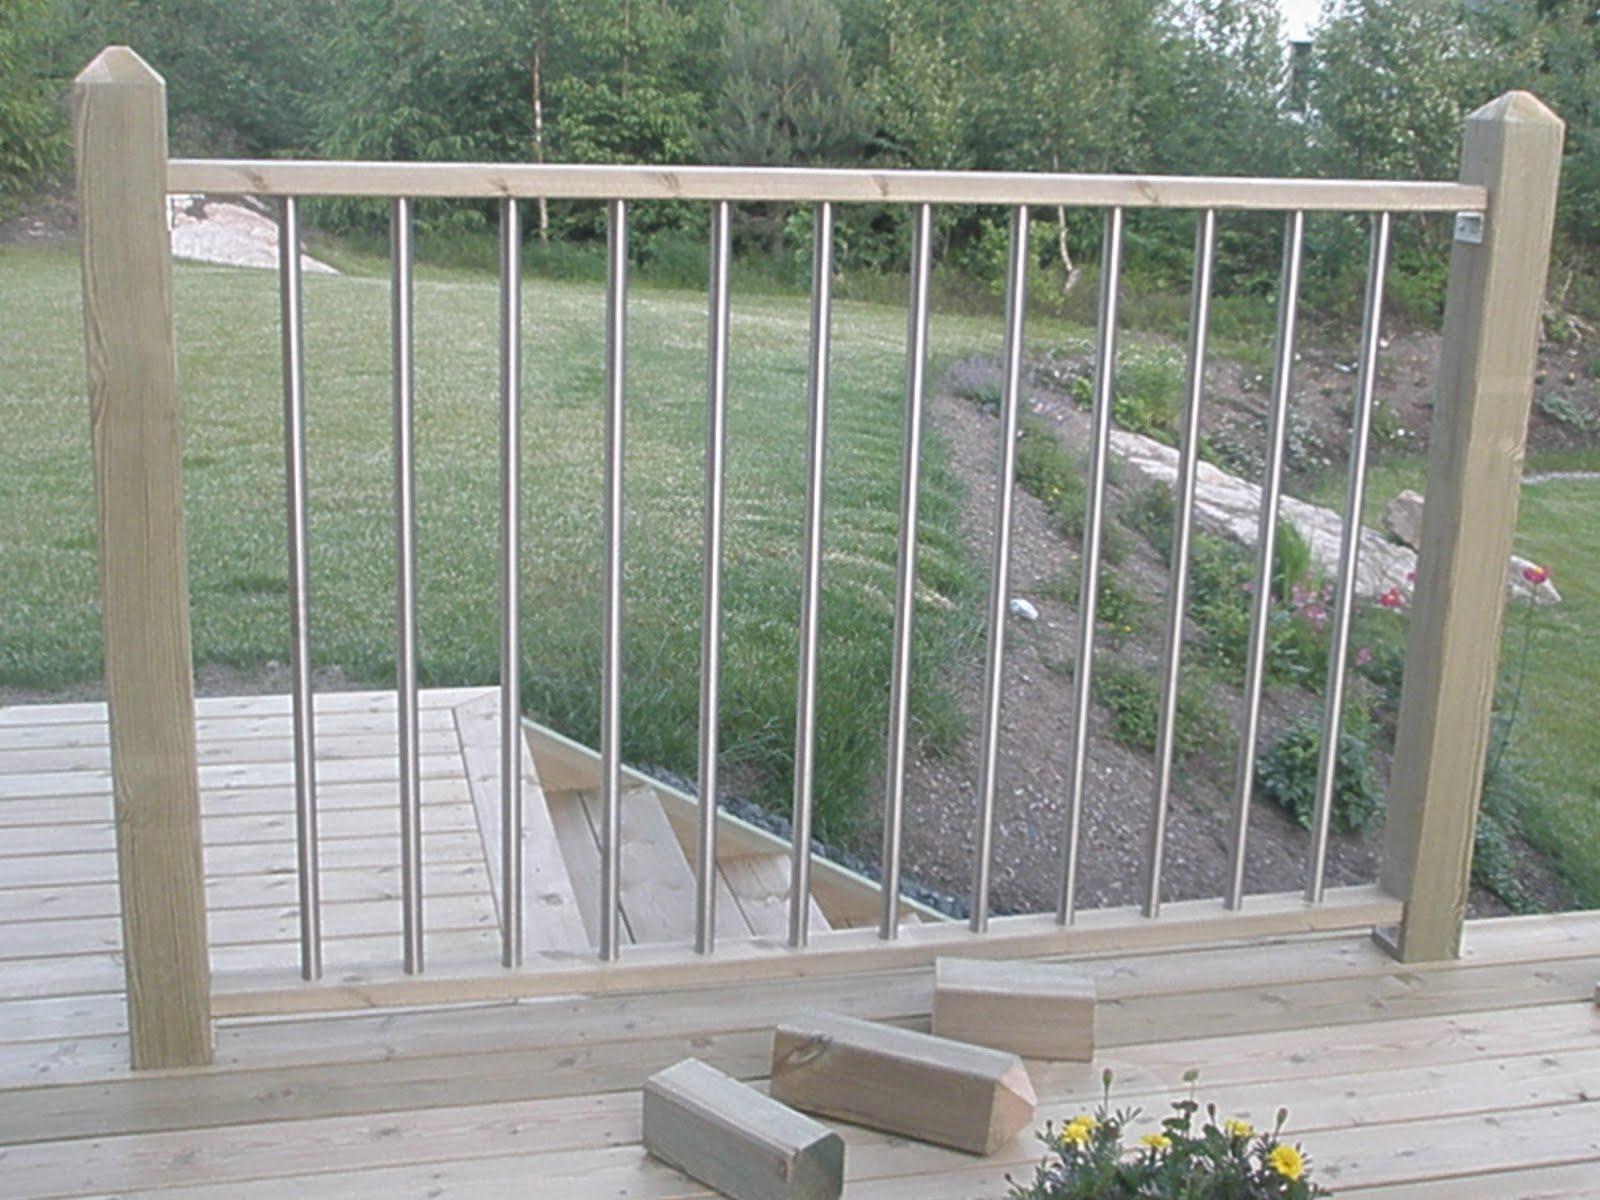 VÃ¥rt hus: juni 2011